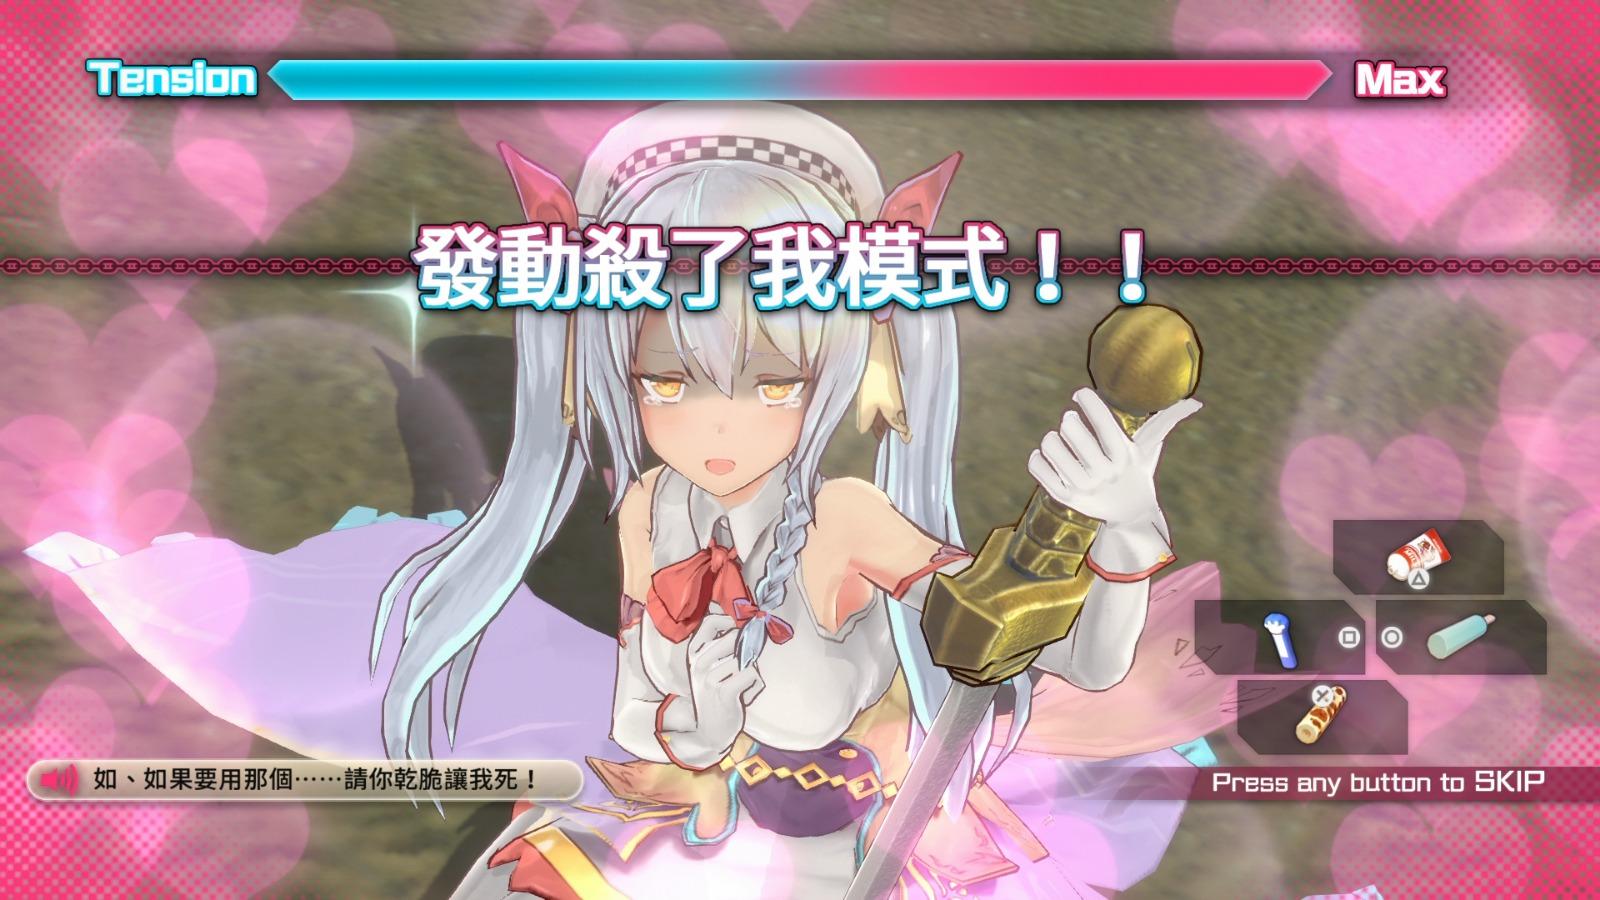 Bullet Girls Phantasia, 子彈少女 幻想曲, PS4, PS Vita, GSE,